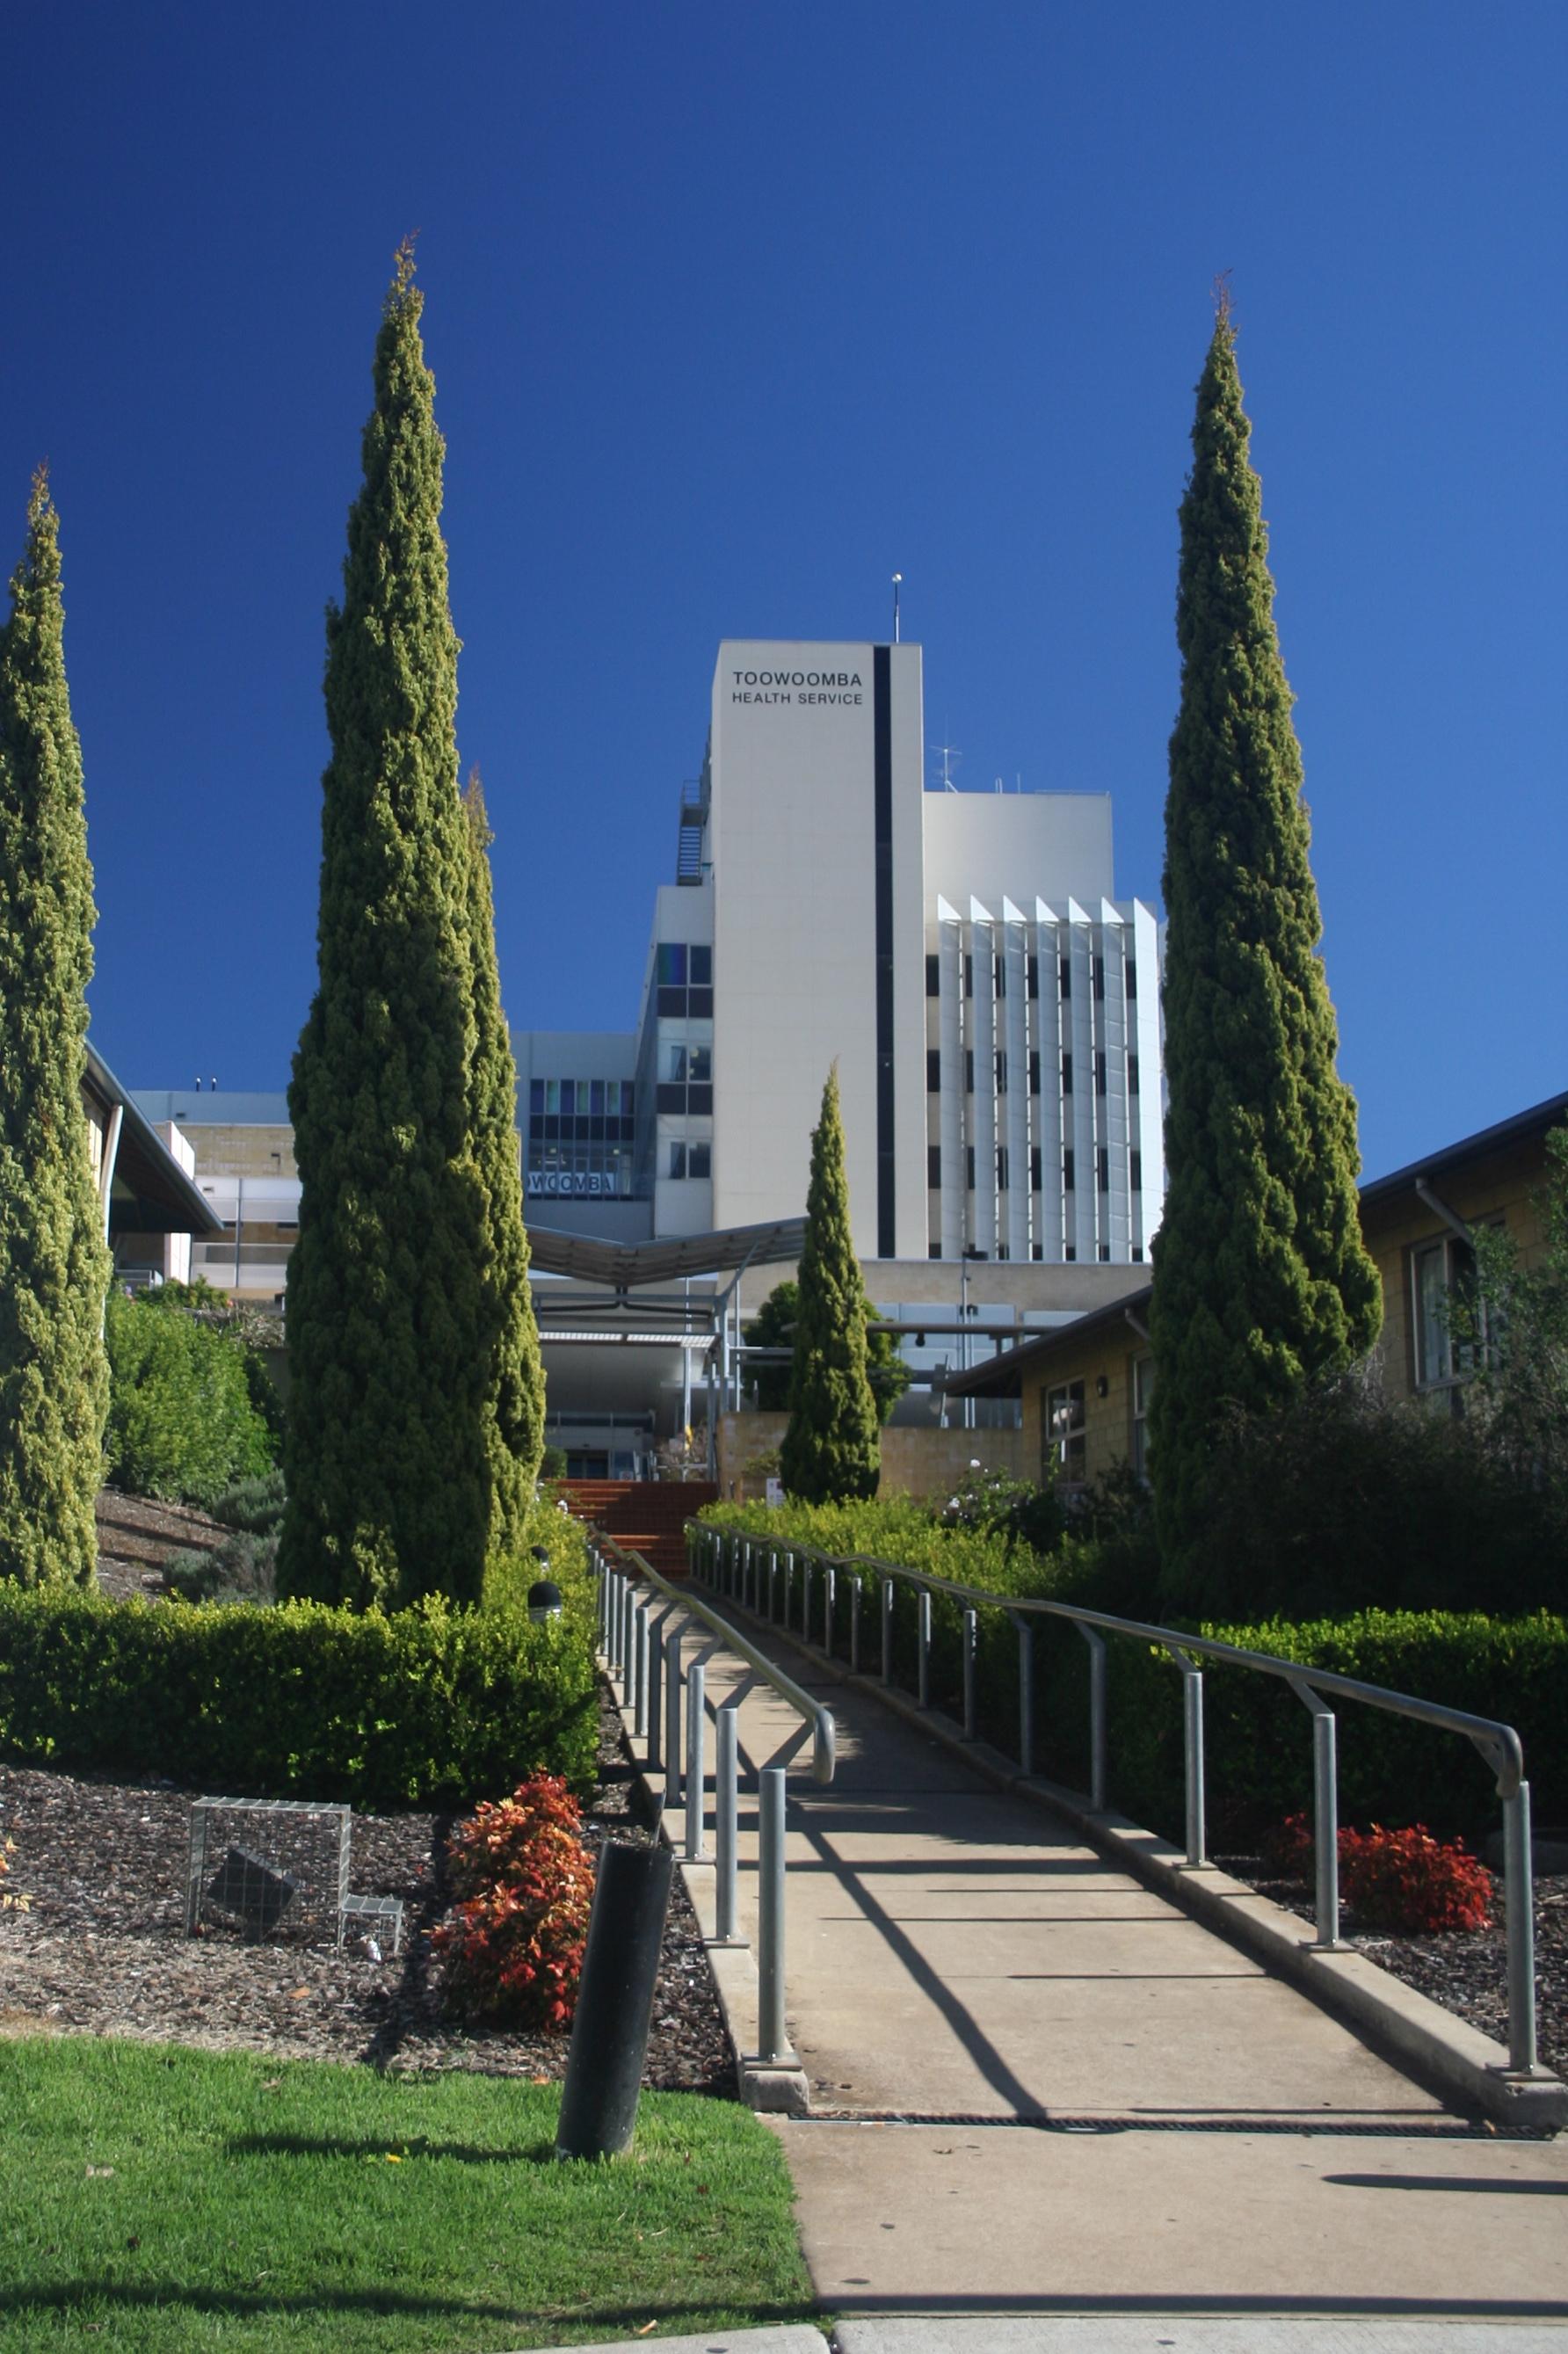 Toowoomba Hospital - Wikipedia